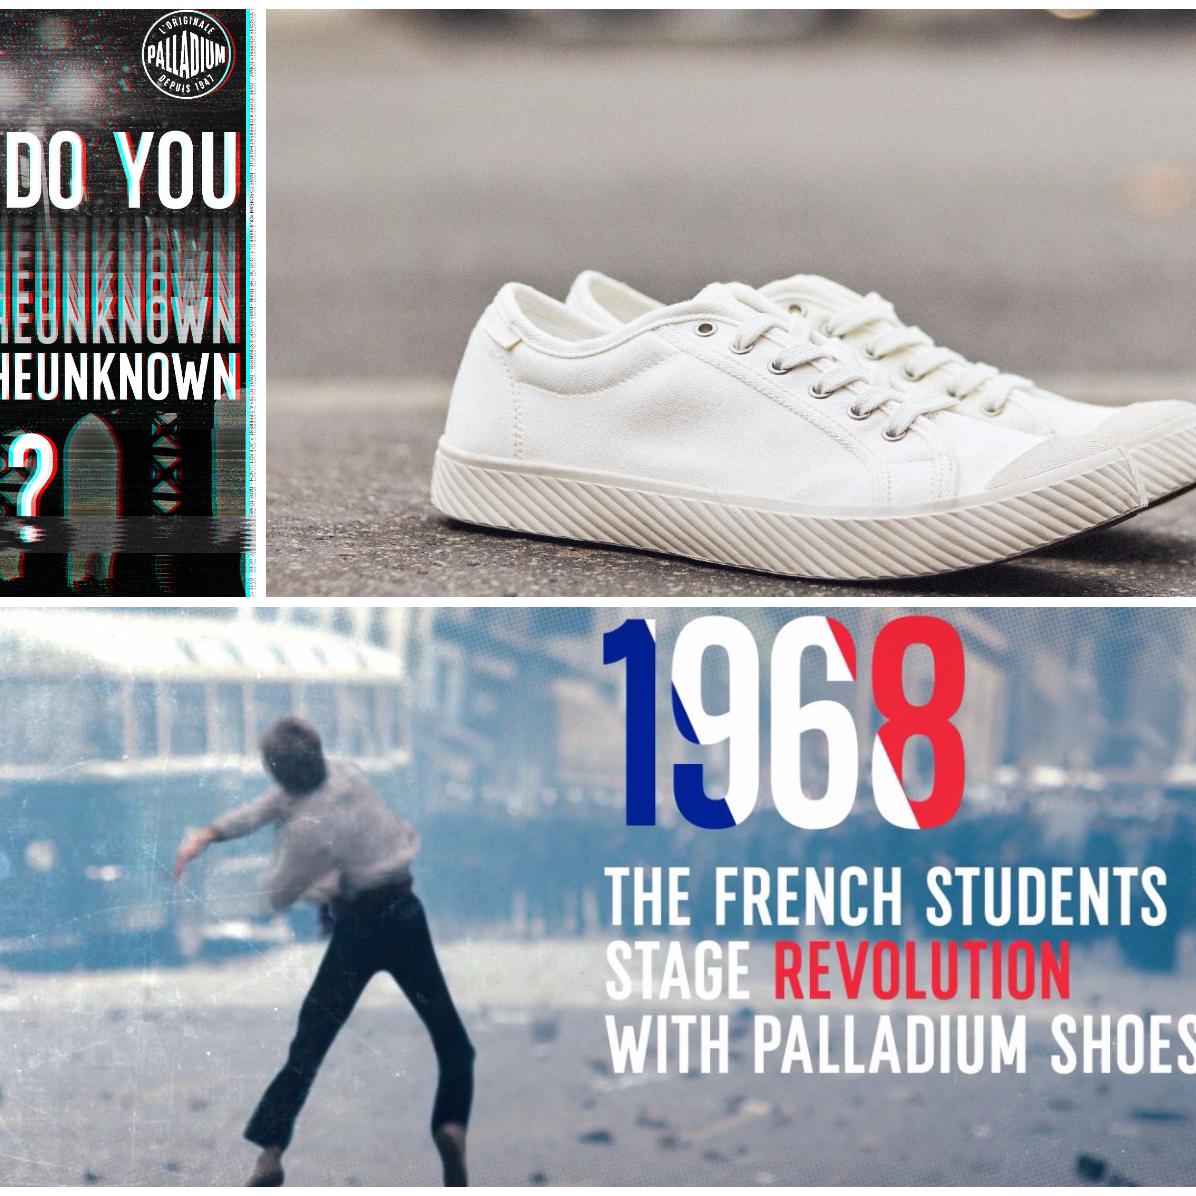 <p>來自法國的時尚小白鞋!源自1968年的復刻經典</p>